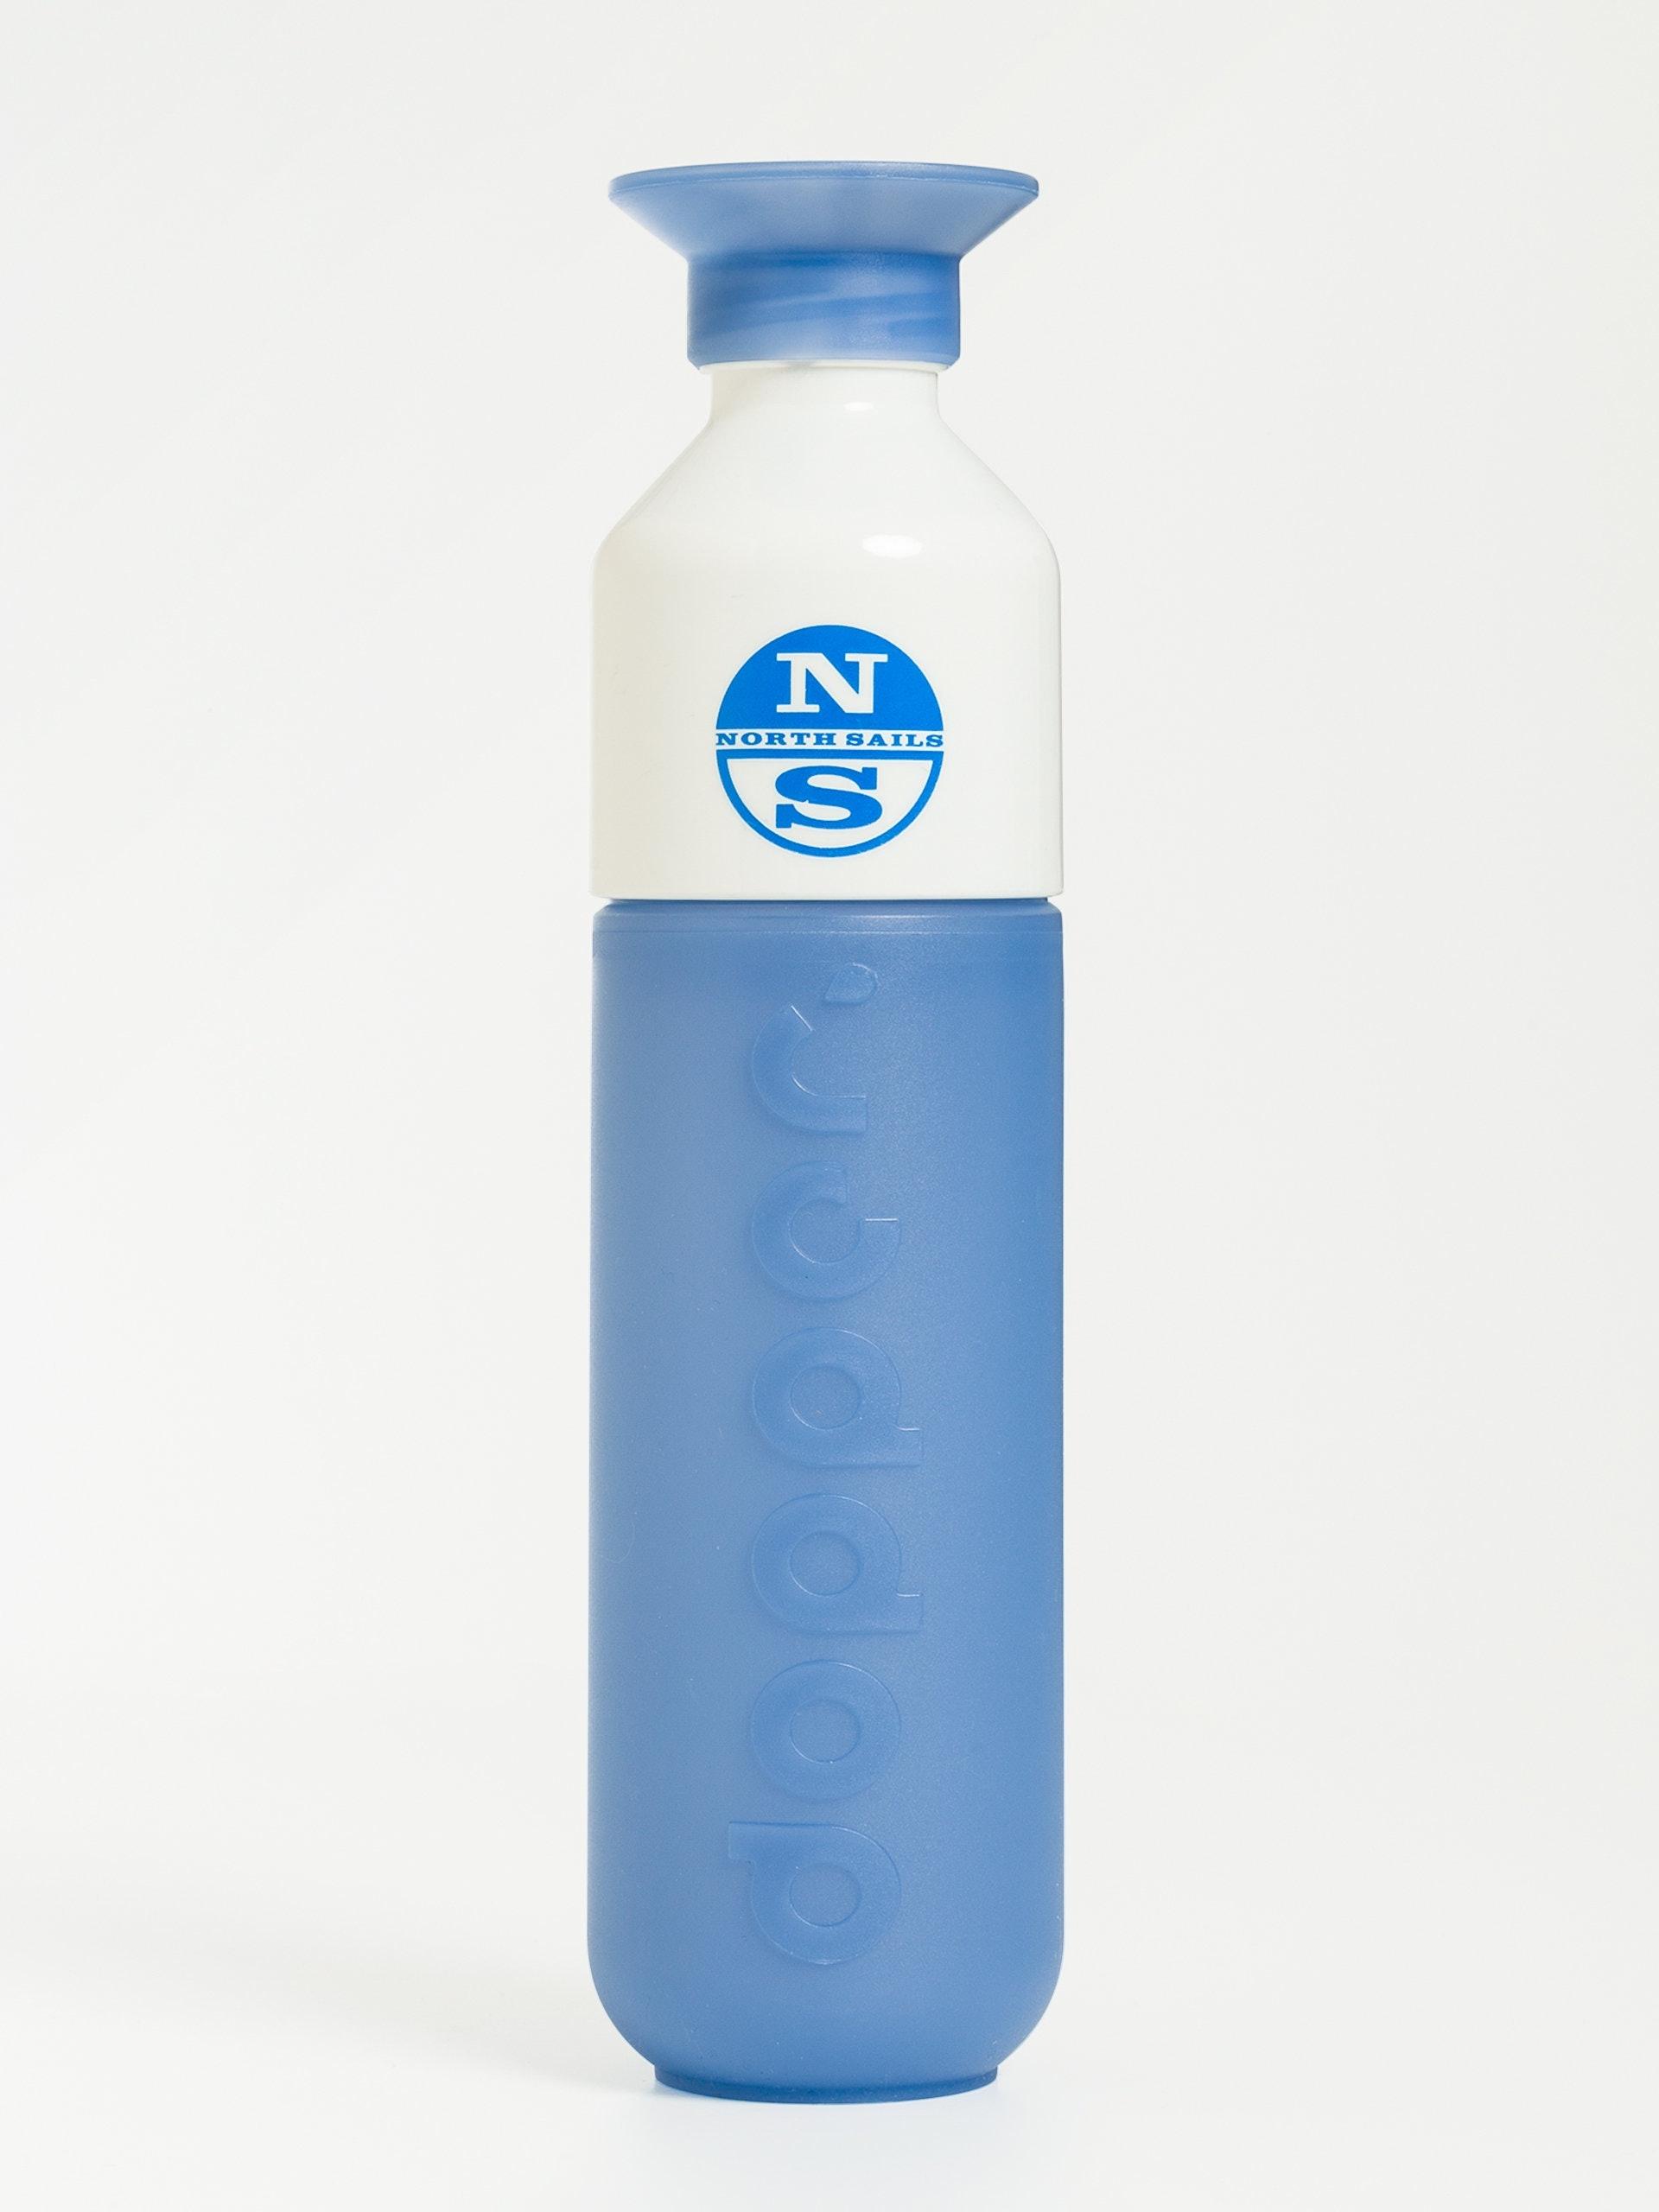 Dopper Bottle (Sustainable)